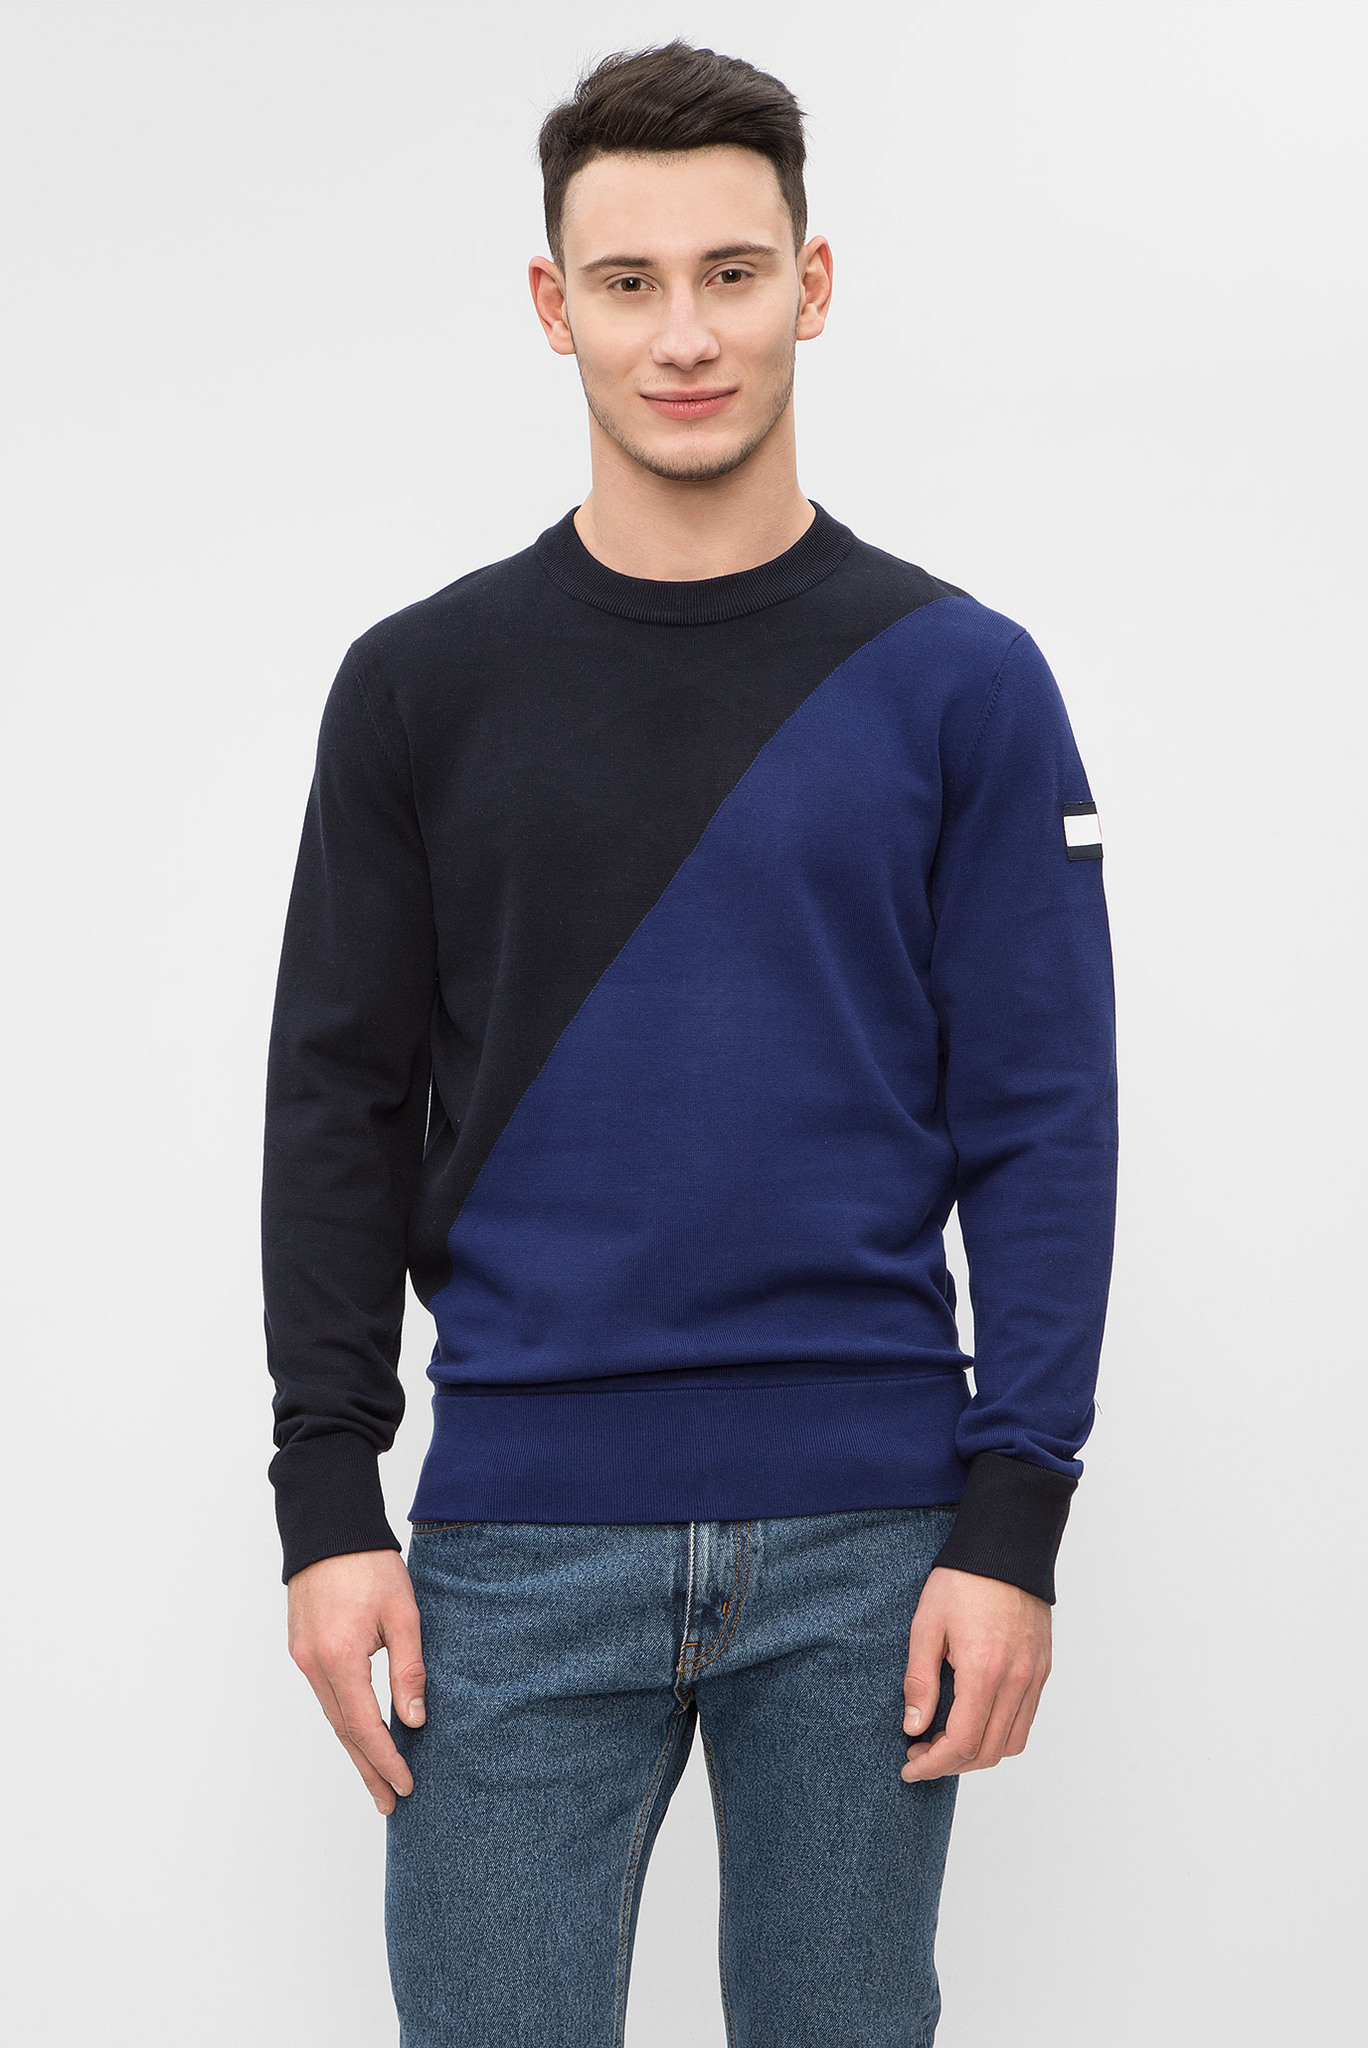 Мужской темно-синий джемпер Tommy Hilfiger